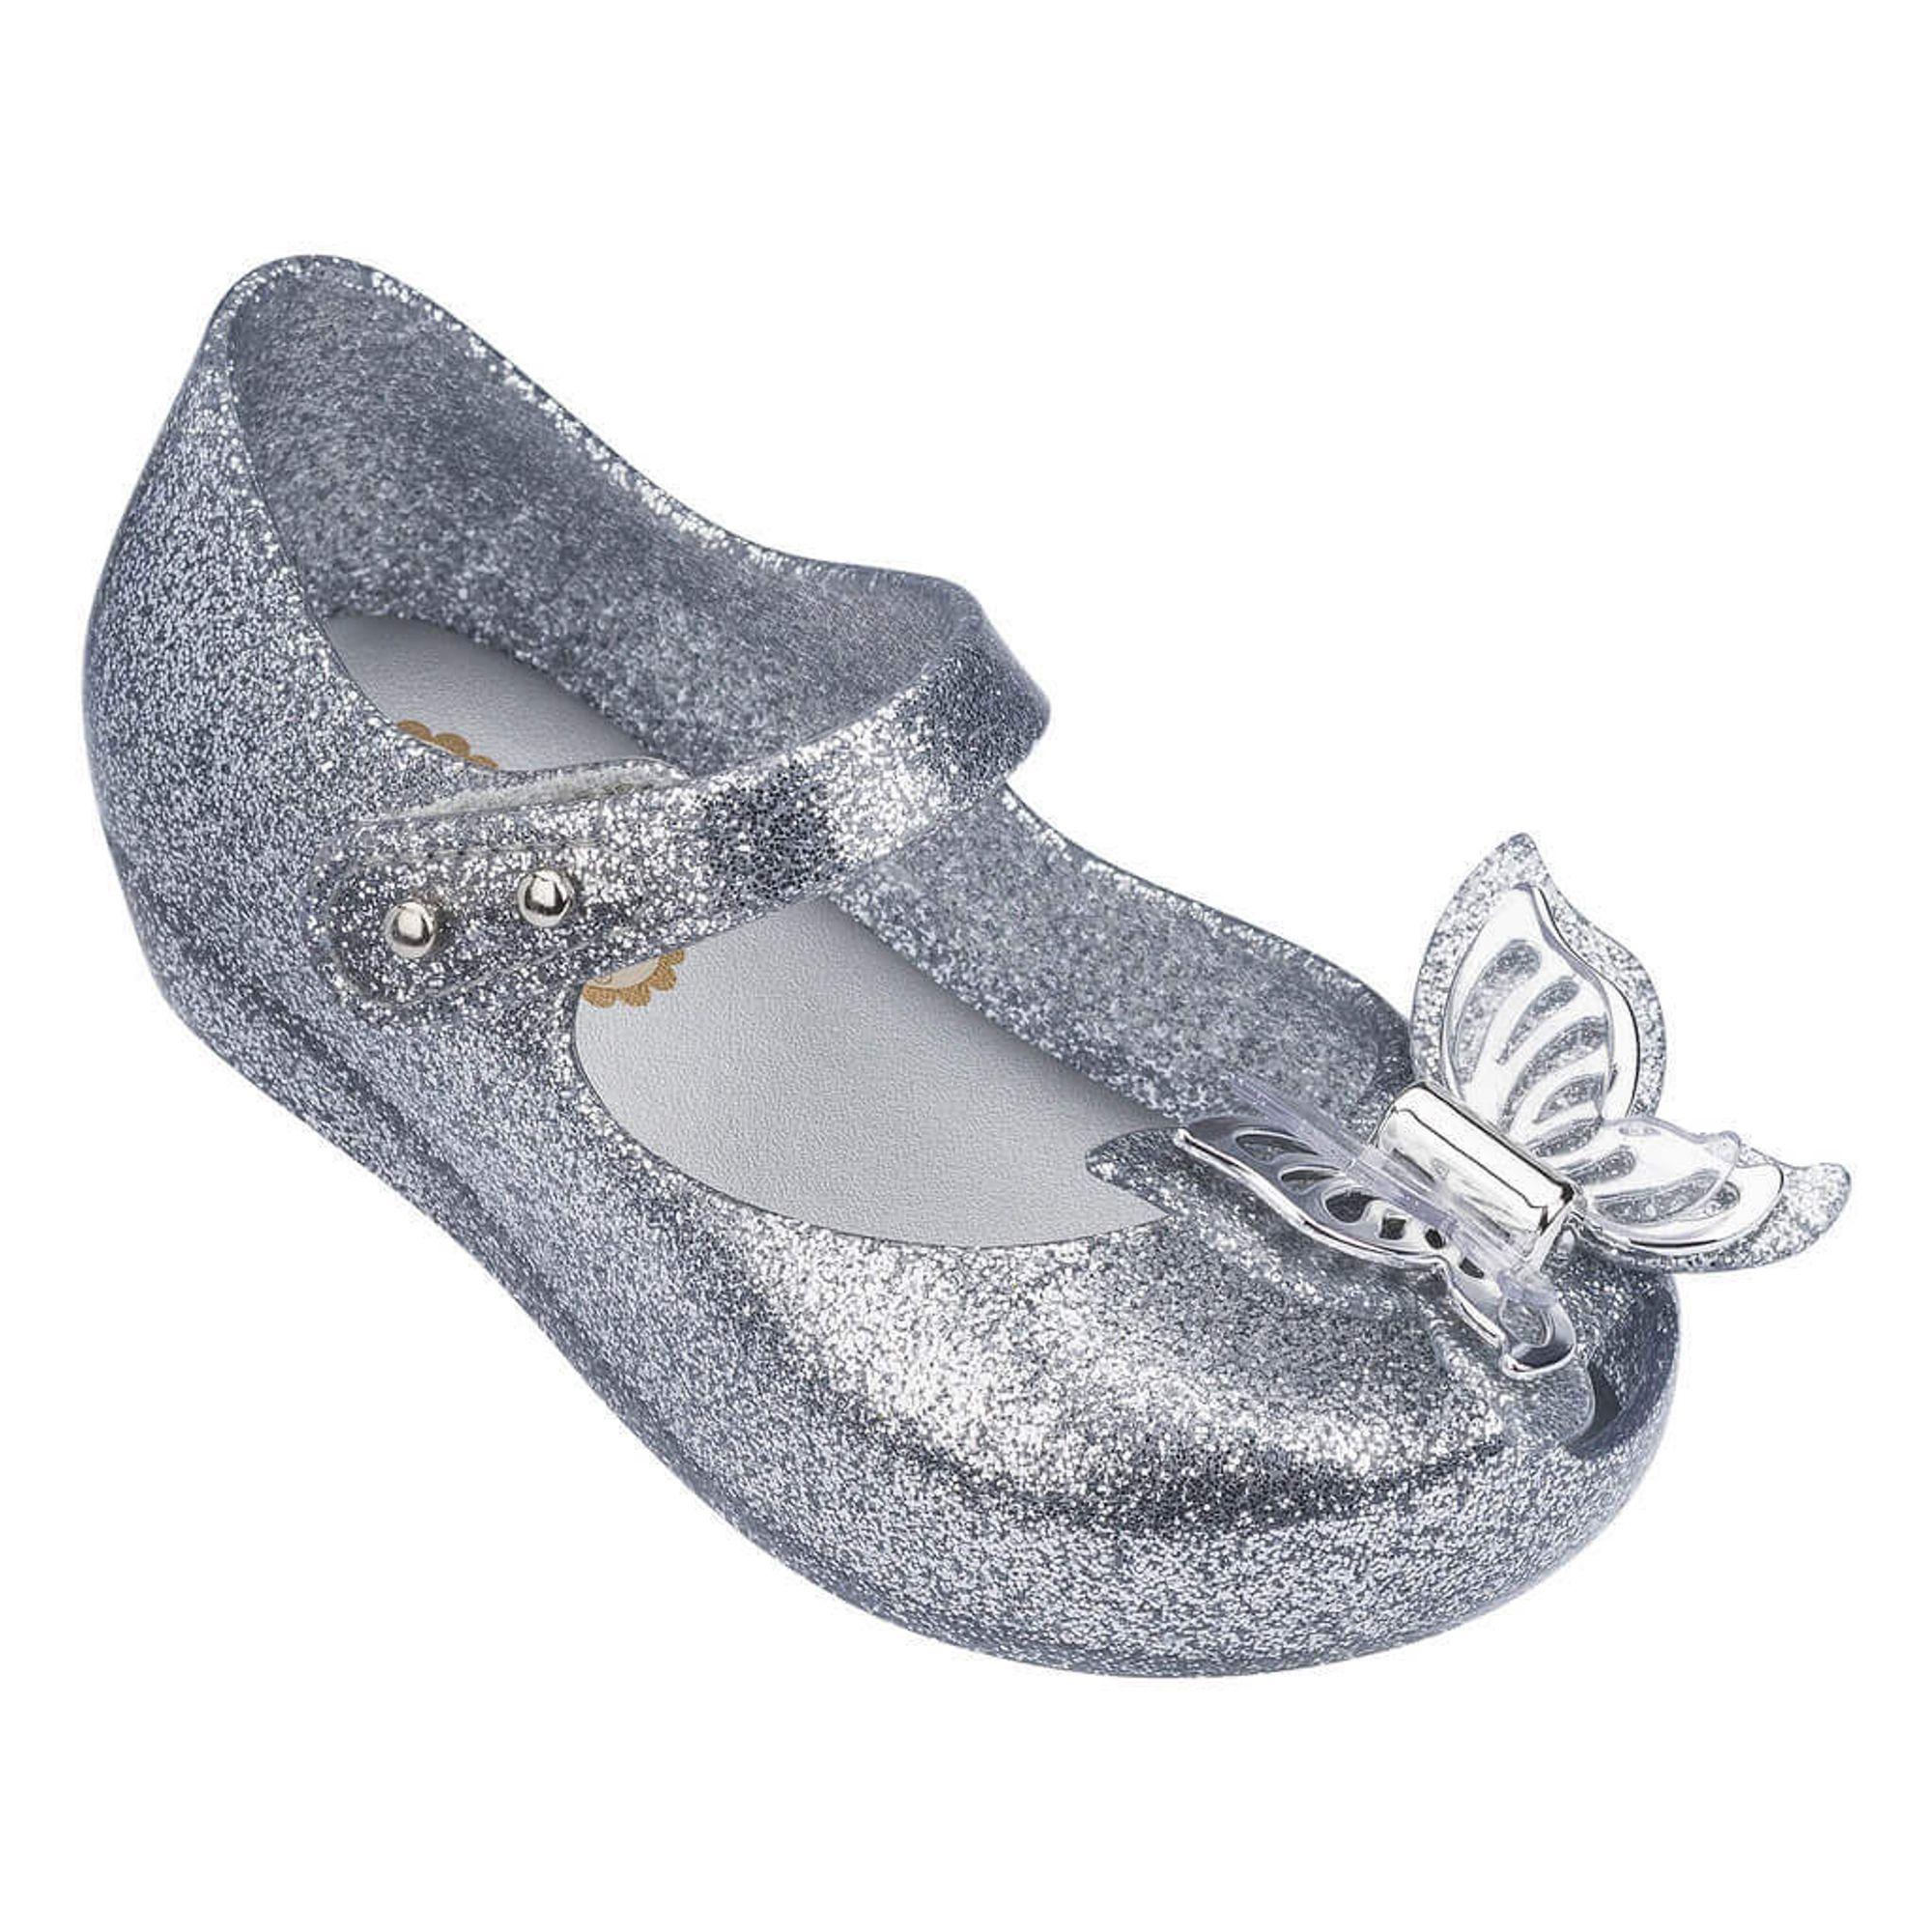 mini-melissa-ultragirl-fly-glitter-prata-lateral